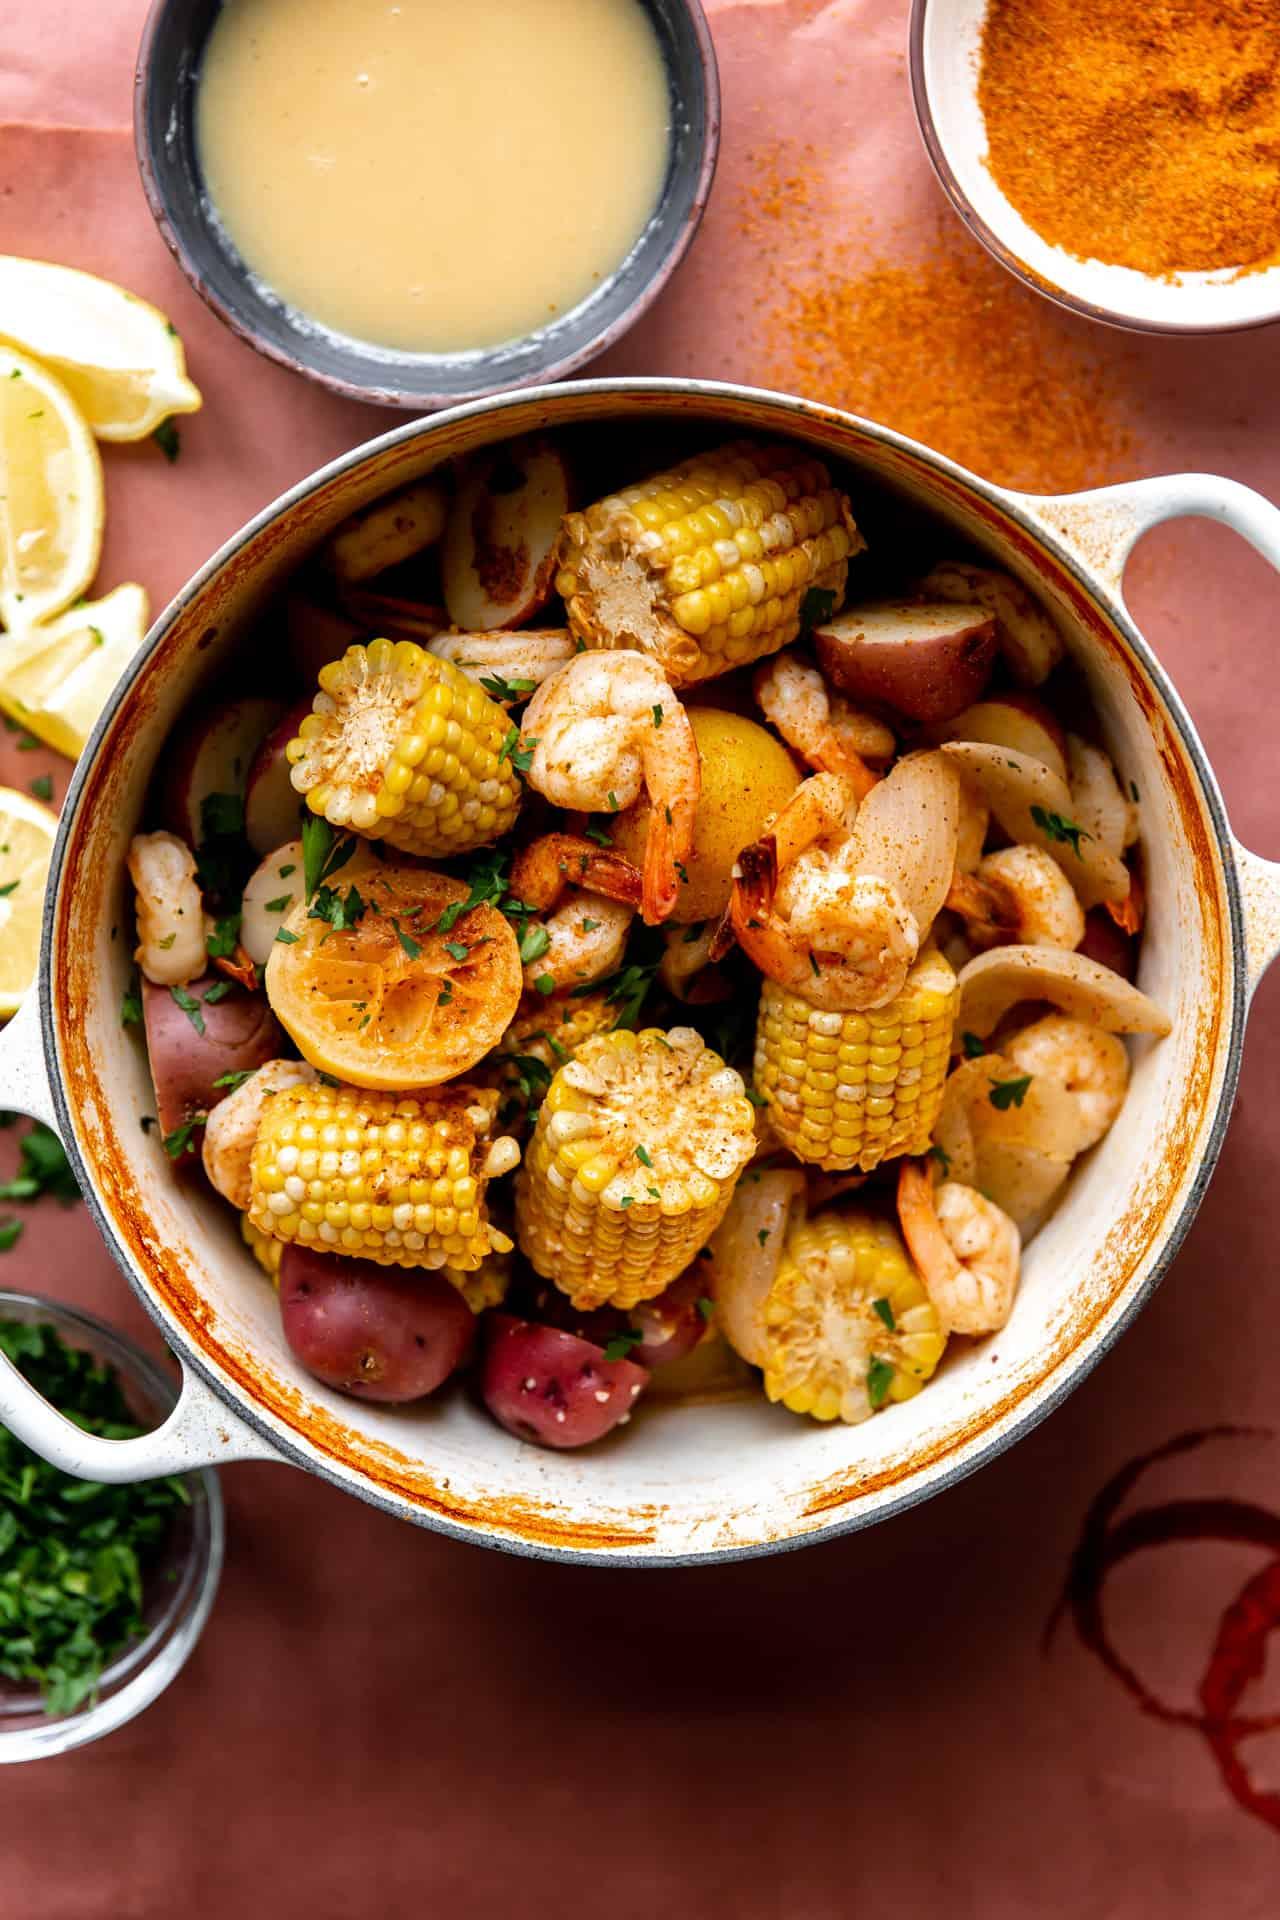 Large pot filled with cooked shrimp boil.